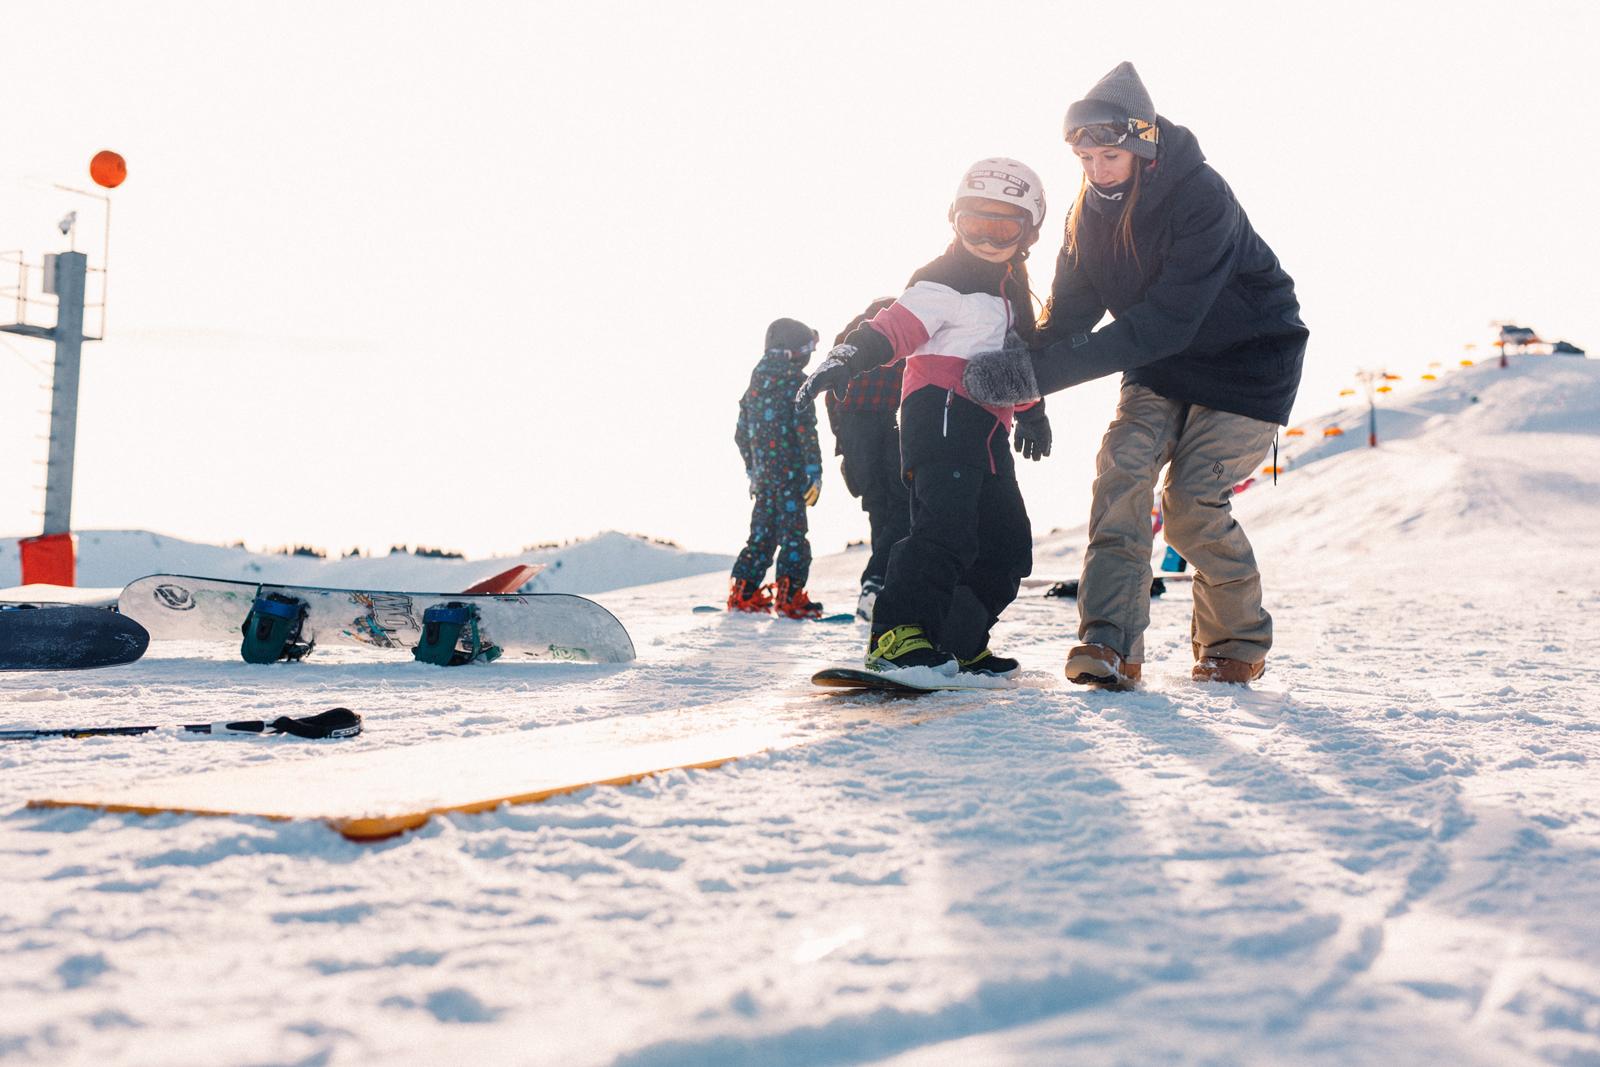 Nitro Kids Getaway 2015 Leogang Prime Snowboarding